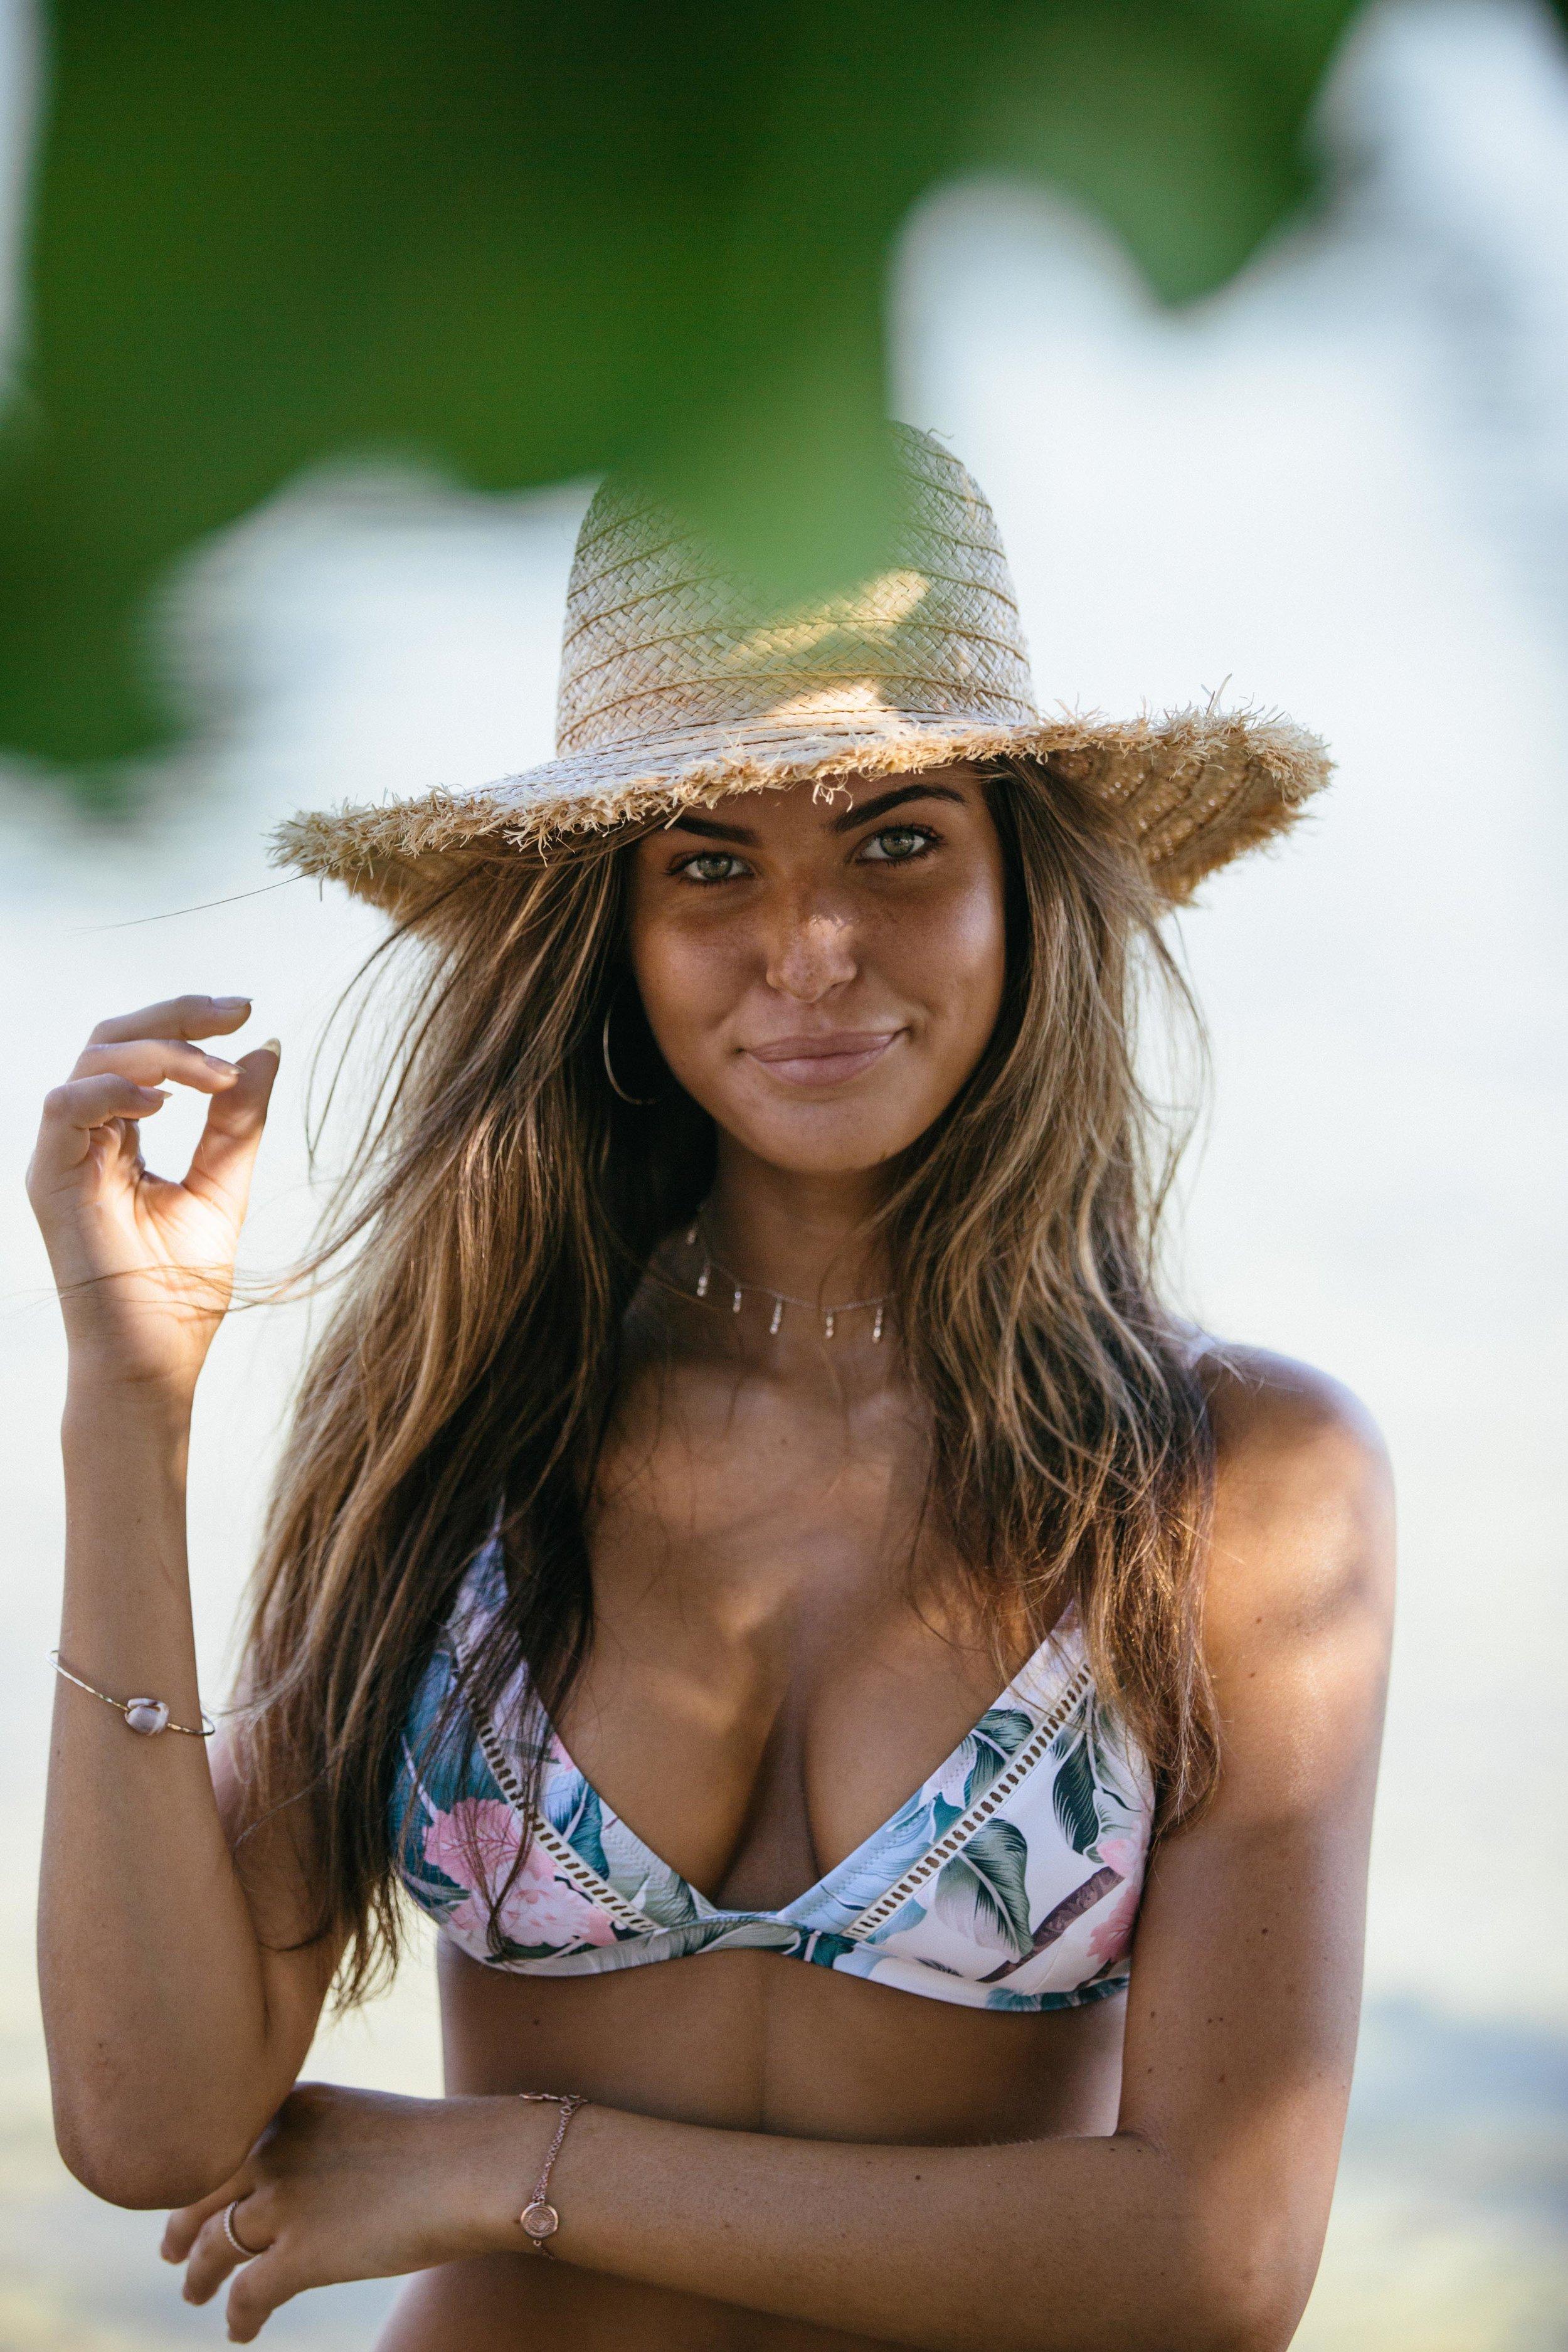 Islander Bralette Top Seashell and Sun Hat 1.jpg